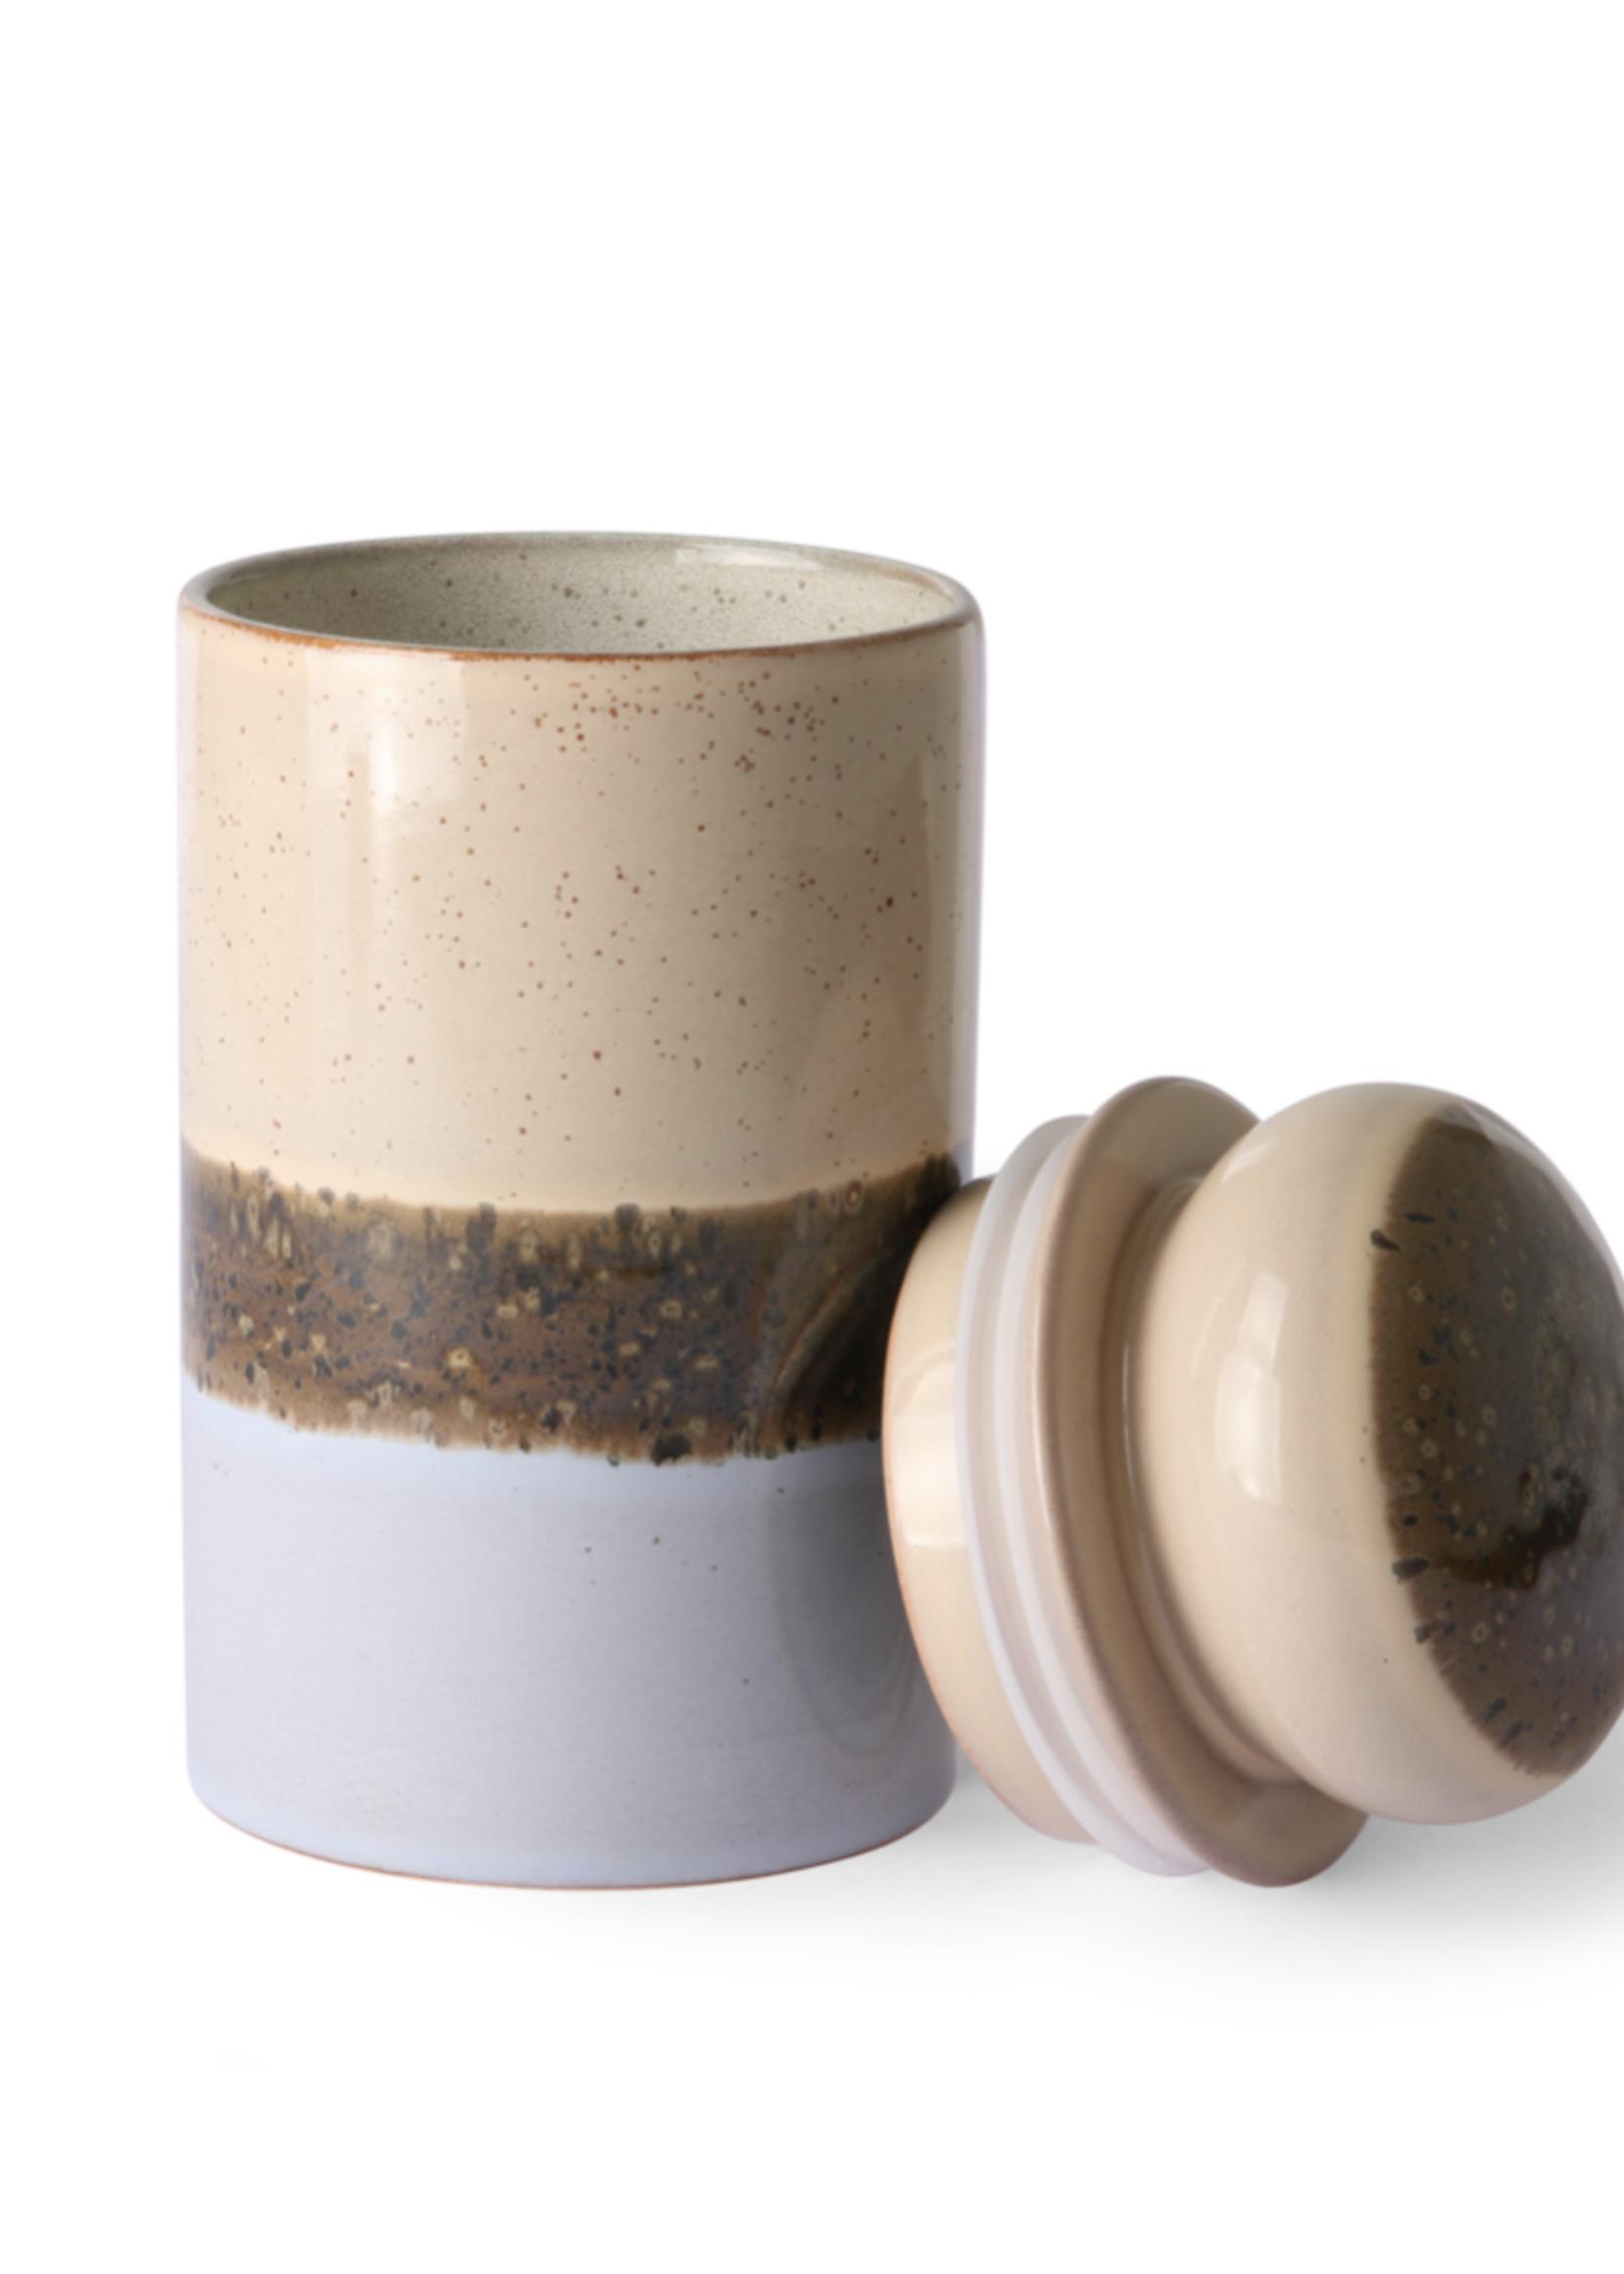 HKliving 70s ceramics: storage jar, lake